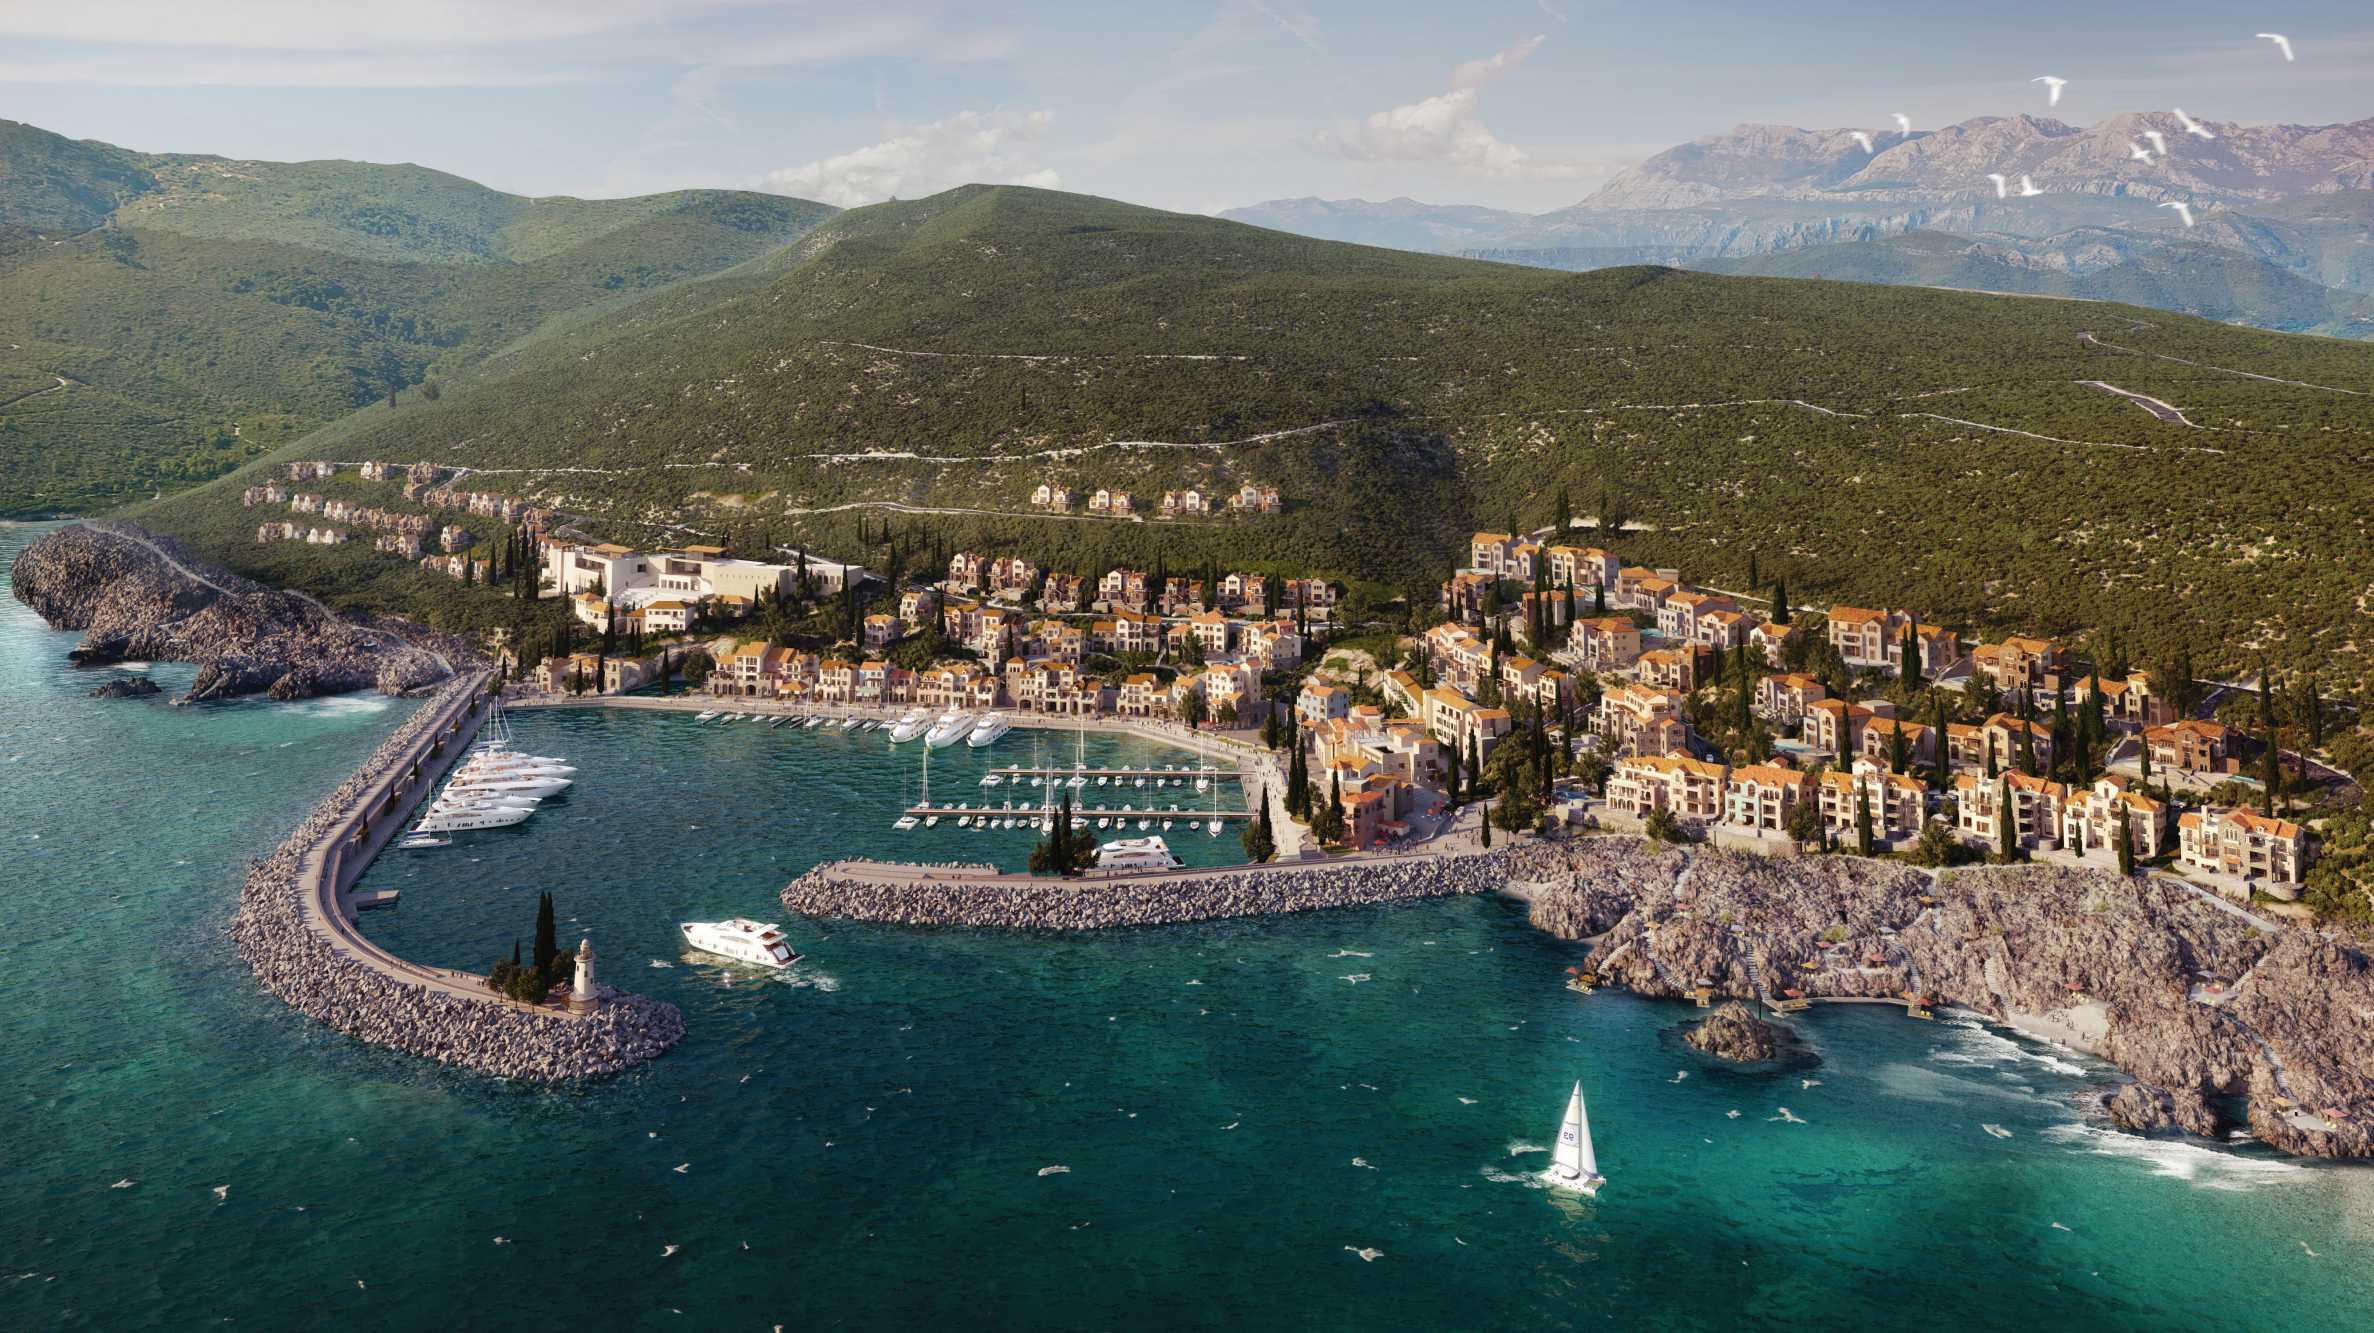 Apartments in world-class luxury resort on the Adriatic coast1 - Stonehard